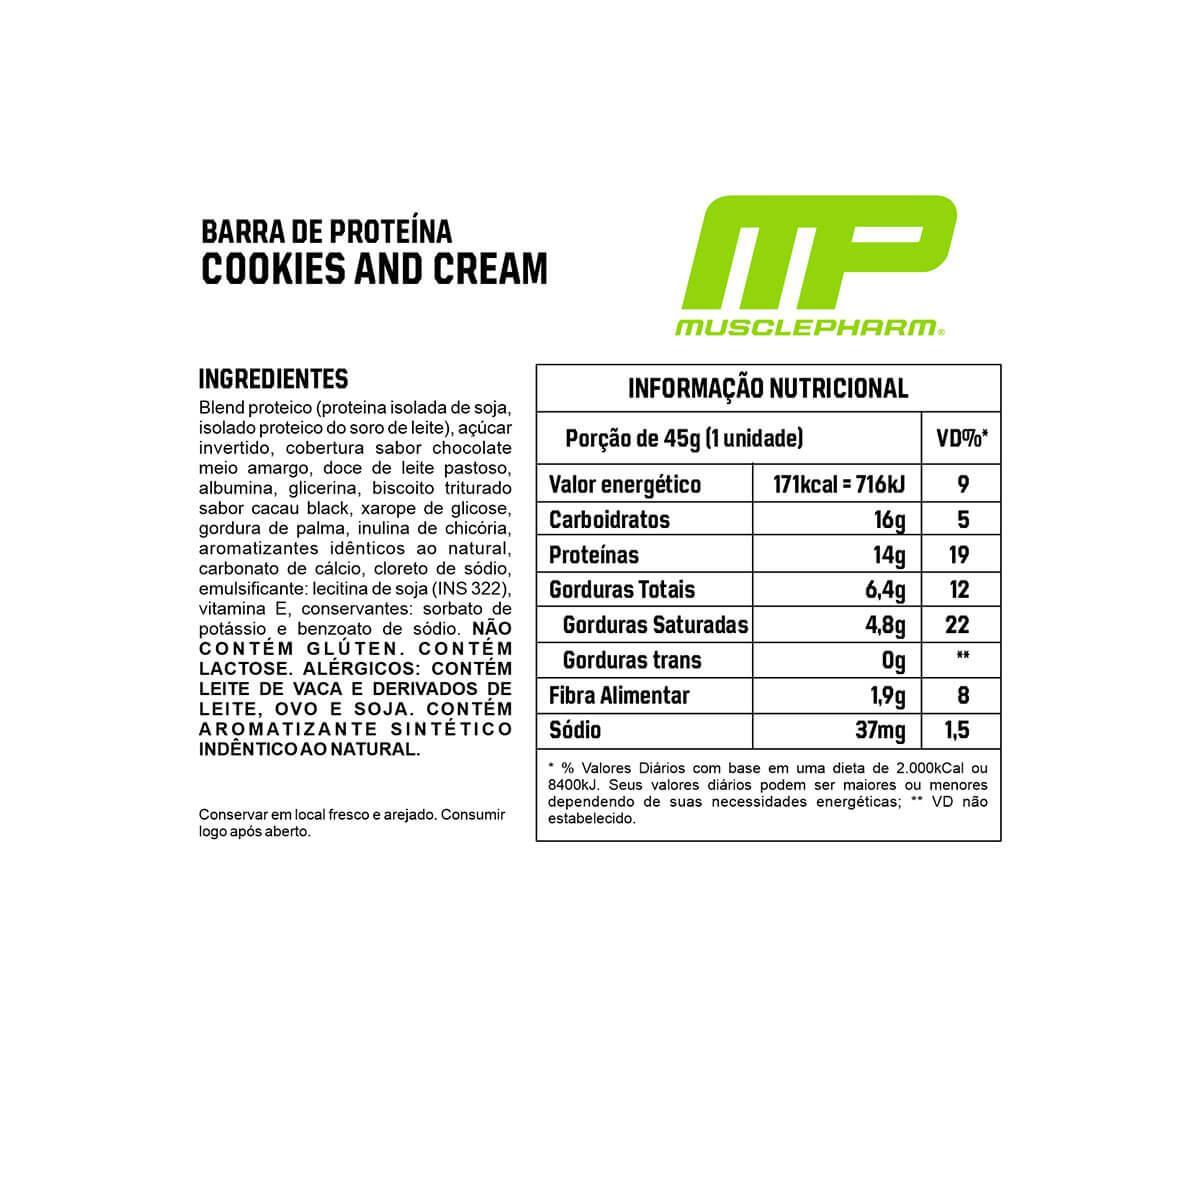 Barrinha de proteina Combat Crunch - Cx C/ 12 unidades - MusclePharm